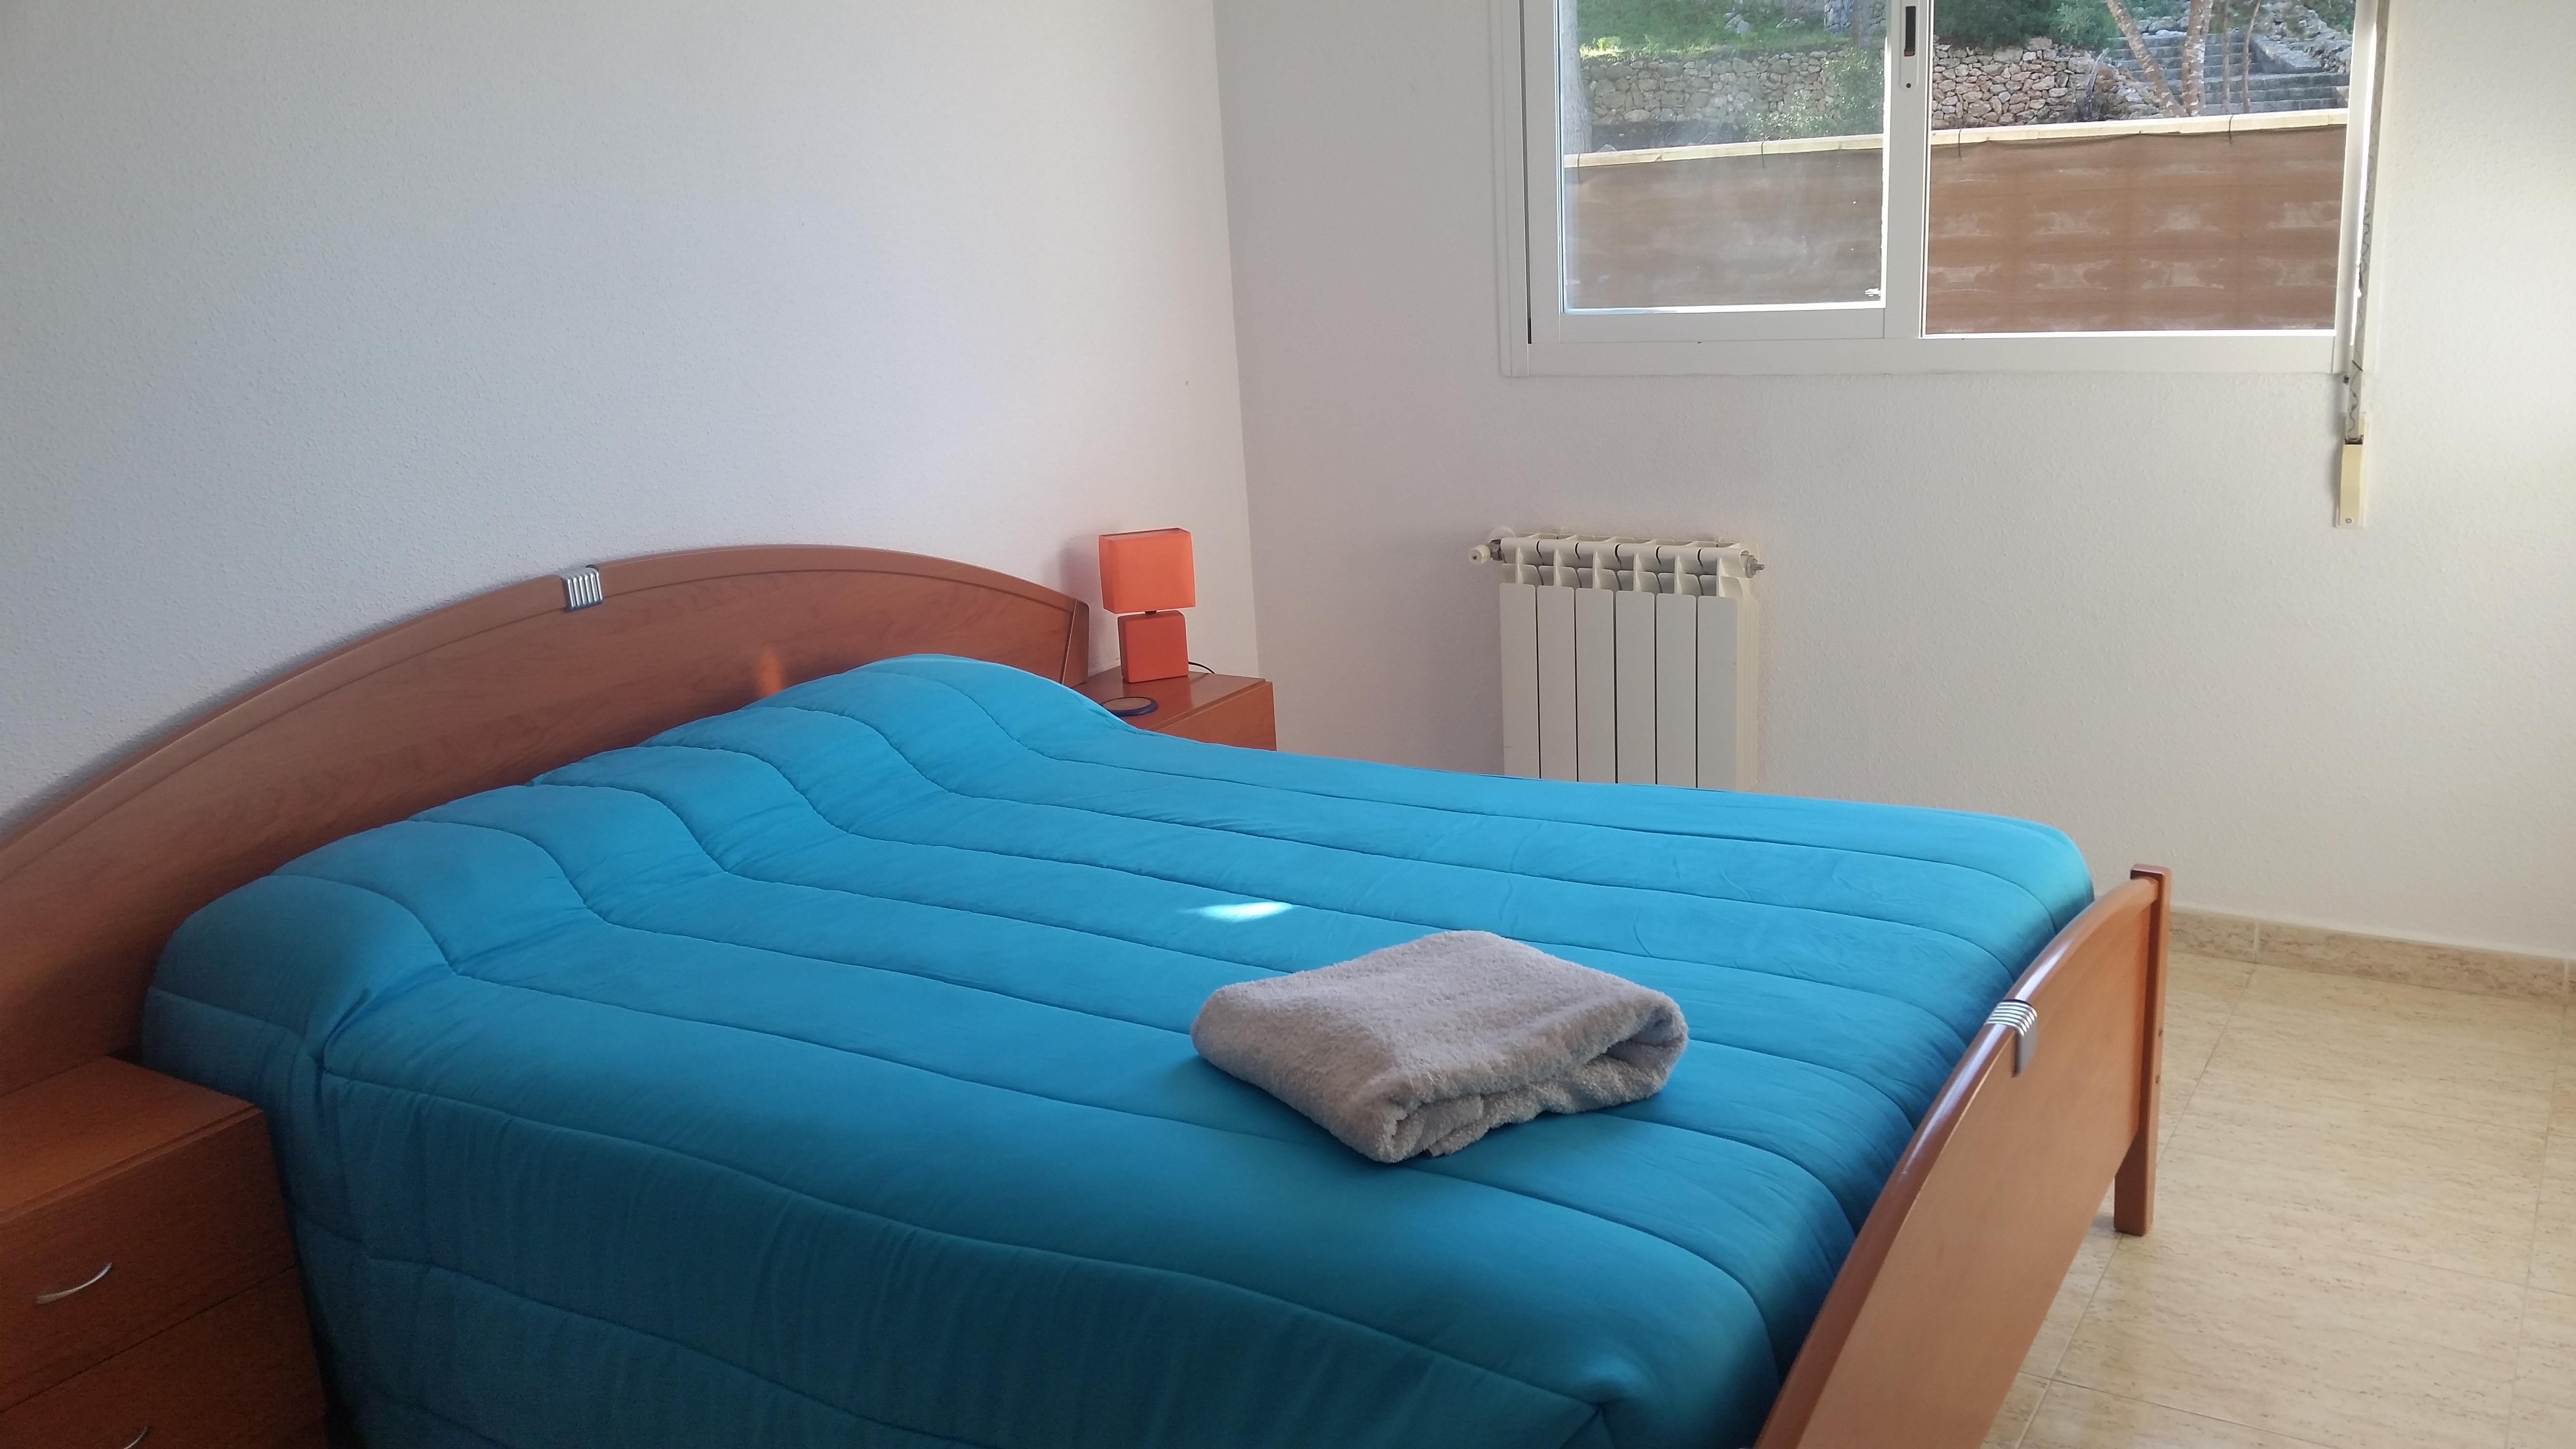 SE F - Double room